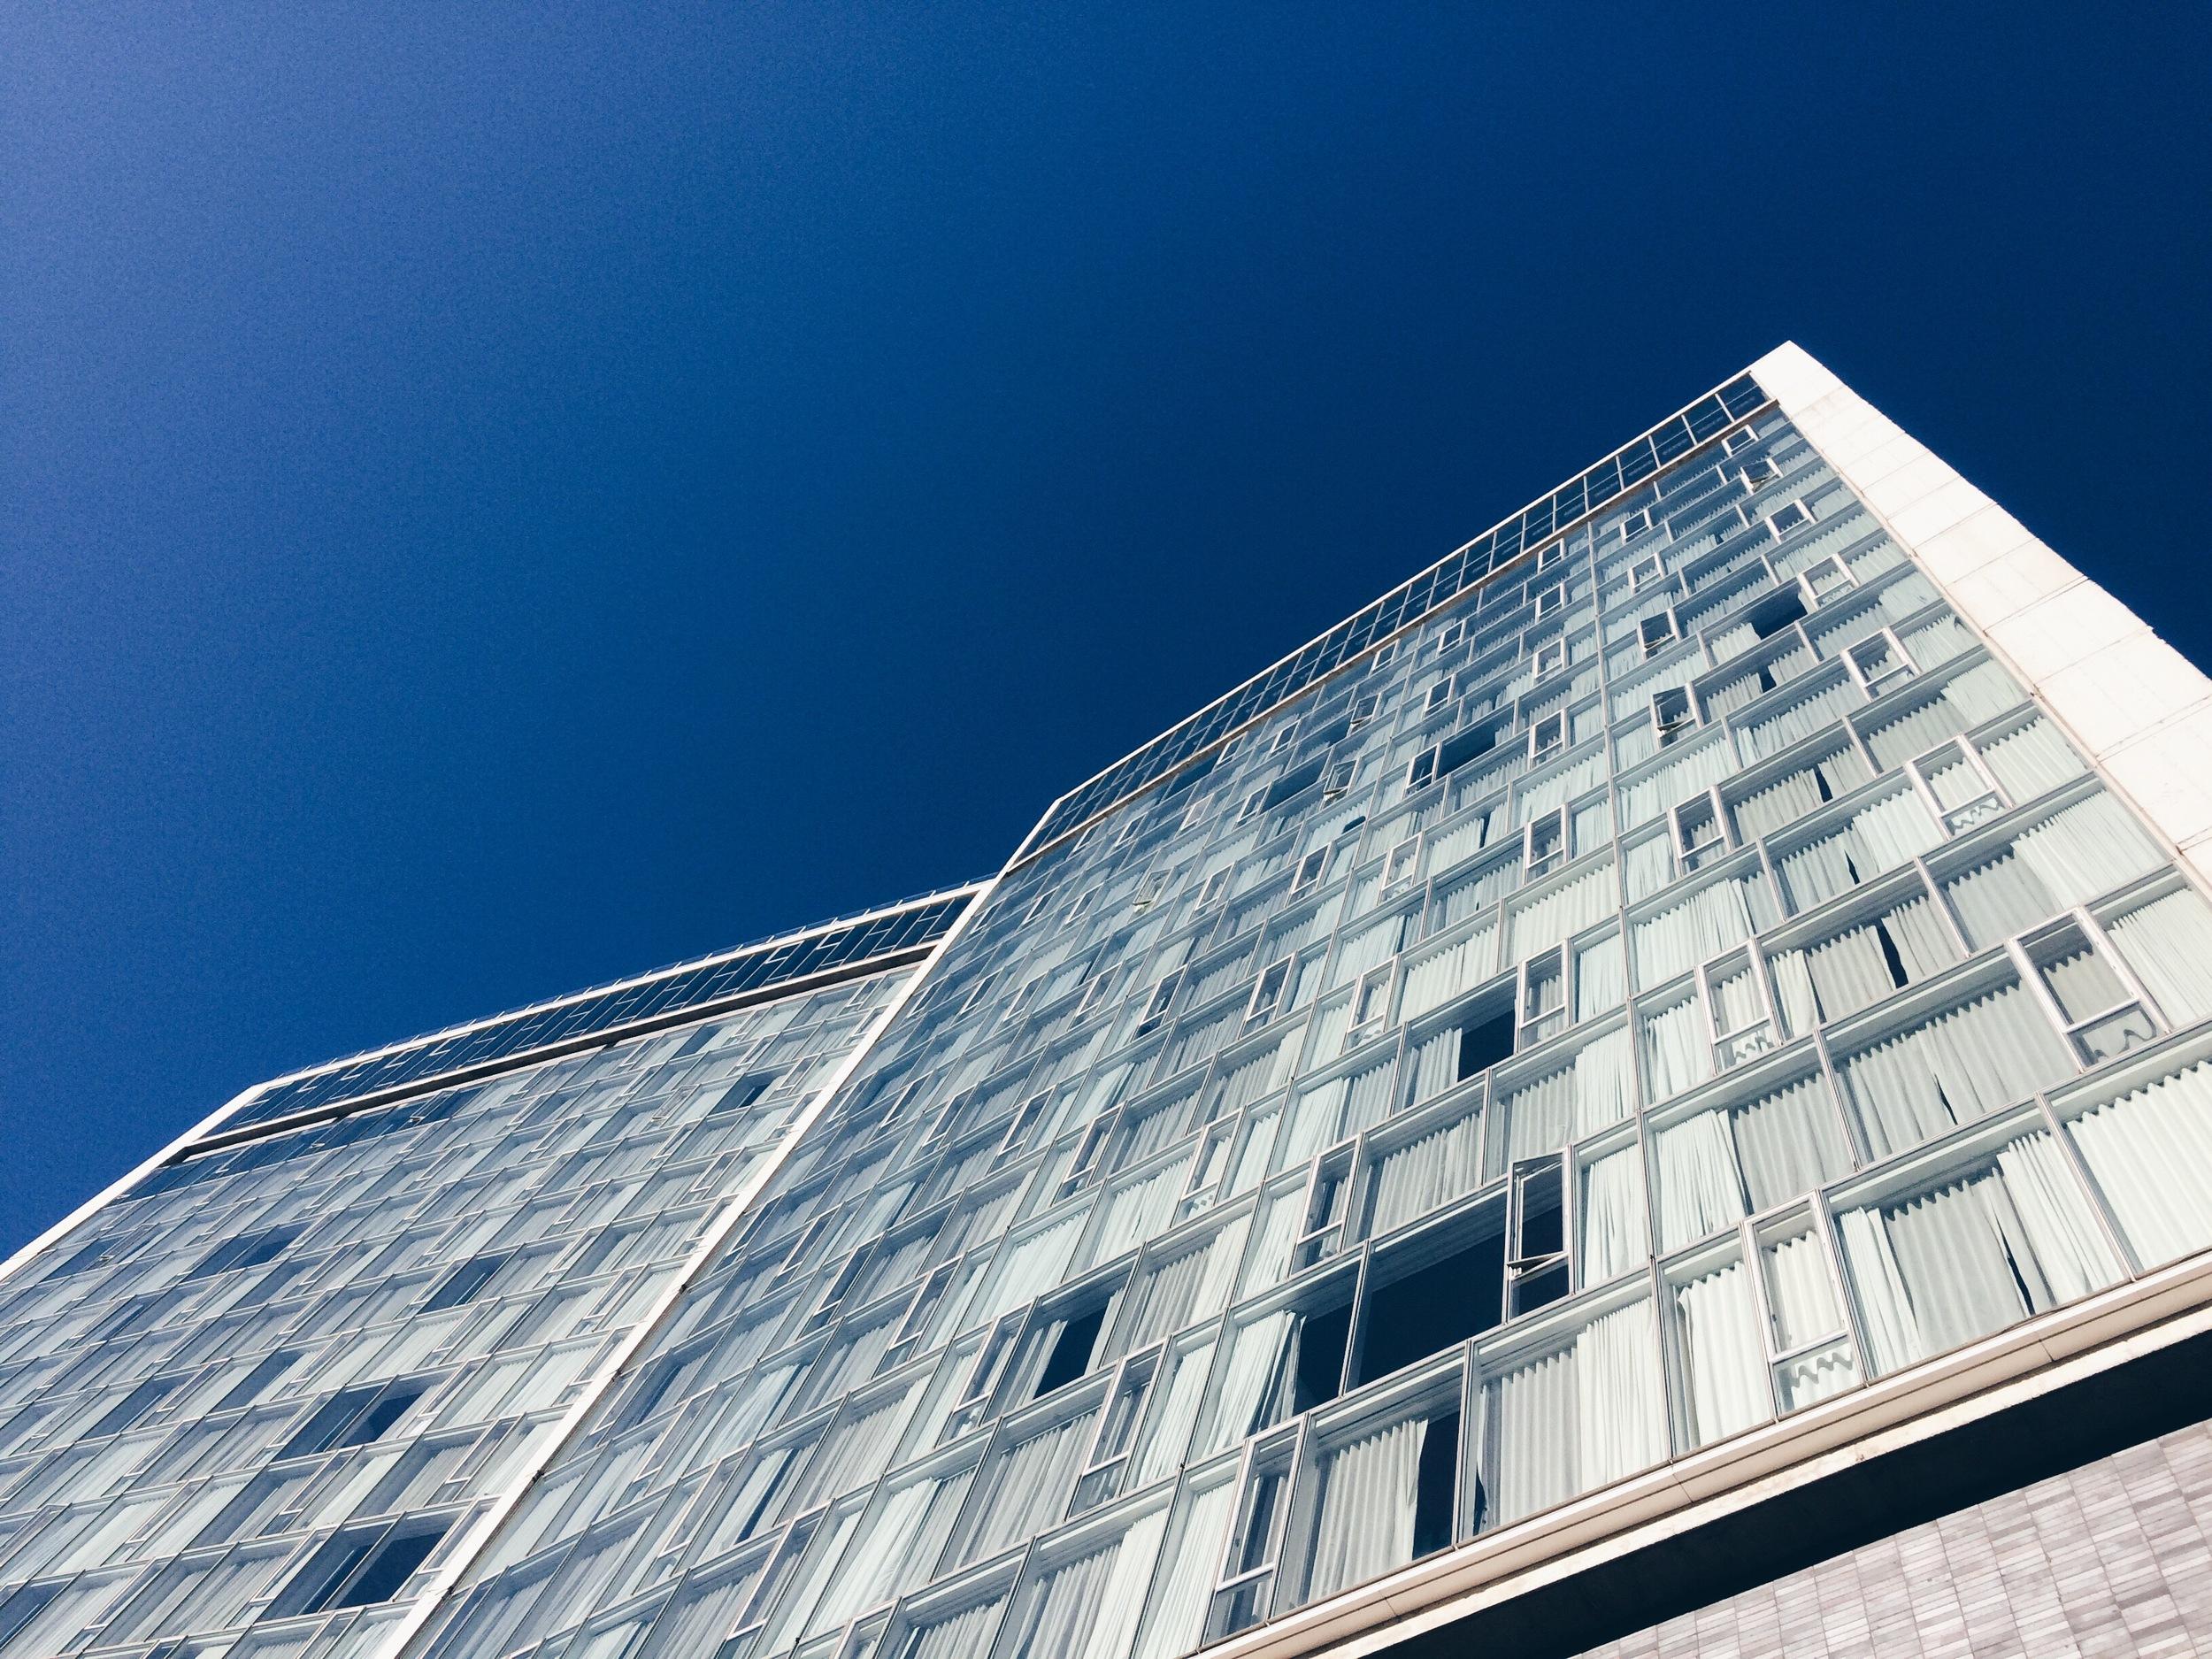 manhattan, new york   the standard hotel by ennead architects